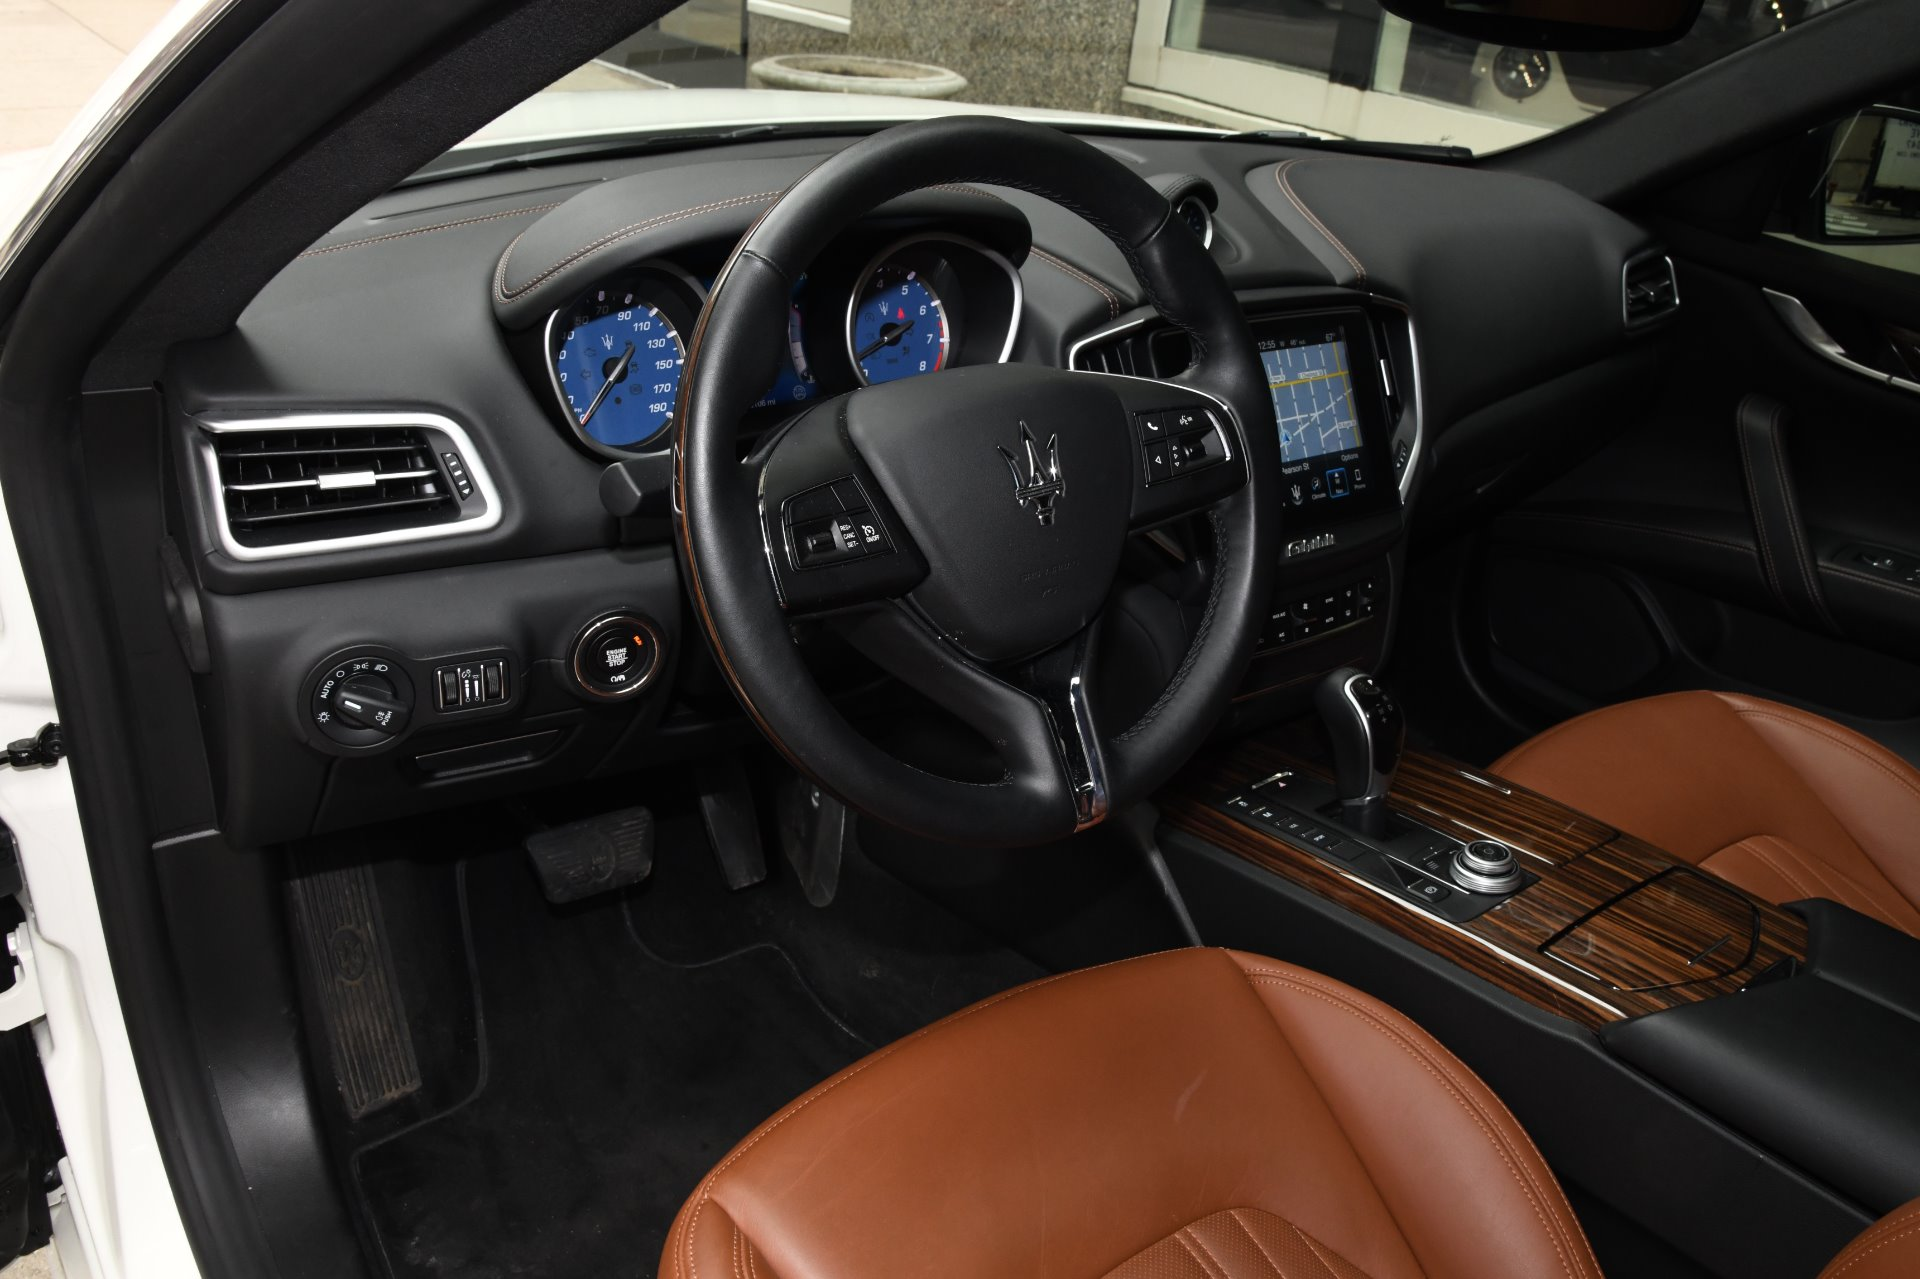 Used 2017 Maserati Ghibli SQ4 S Q4 | Chicago, IL